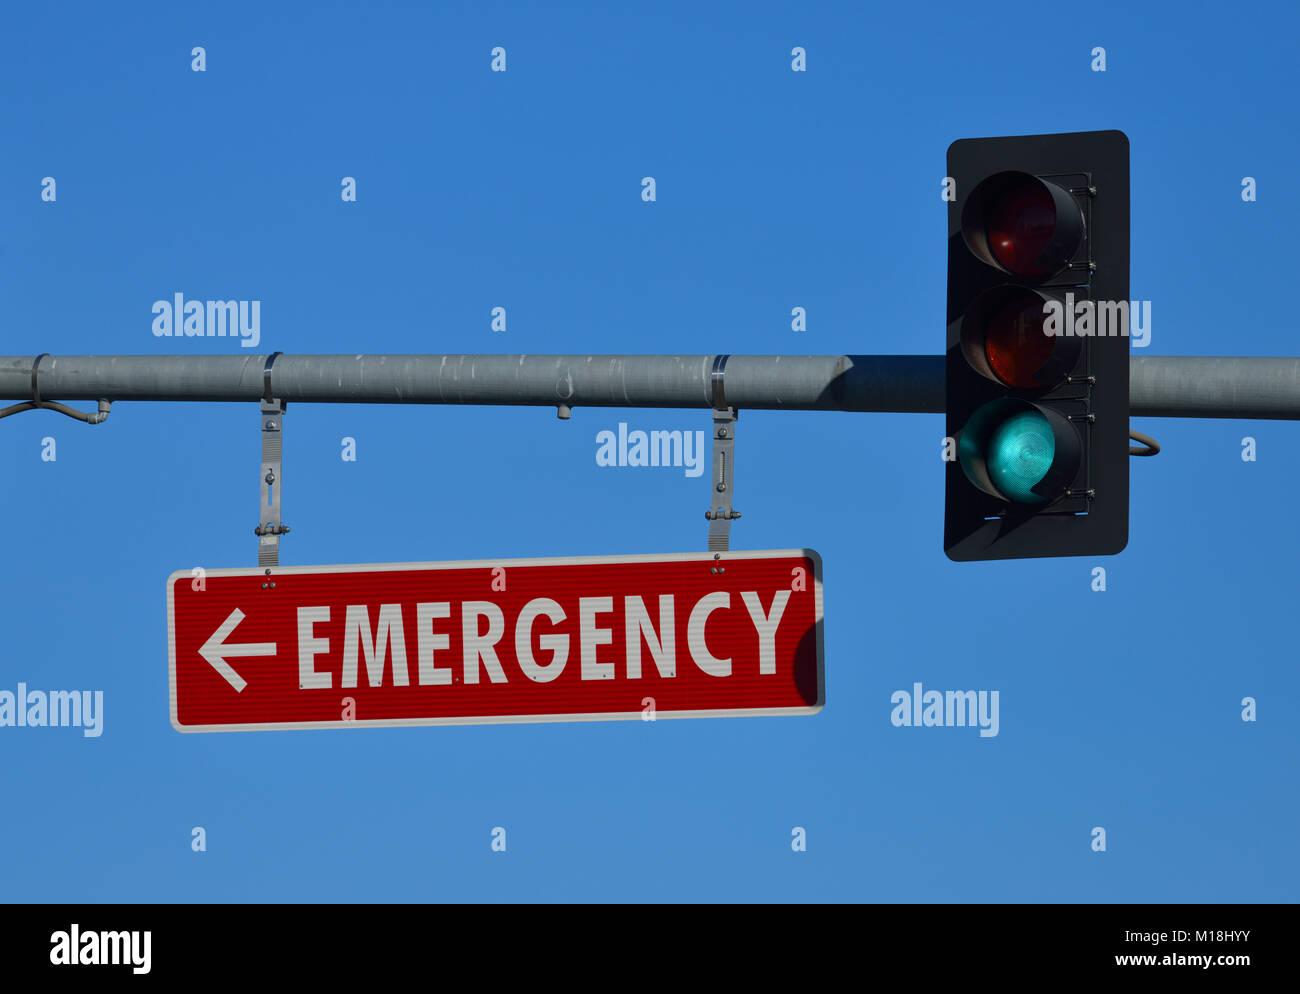 Emergency sign at SCVM Center, San Jose CA - Stock Image